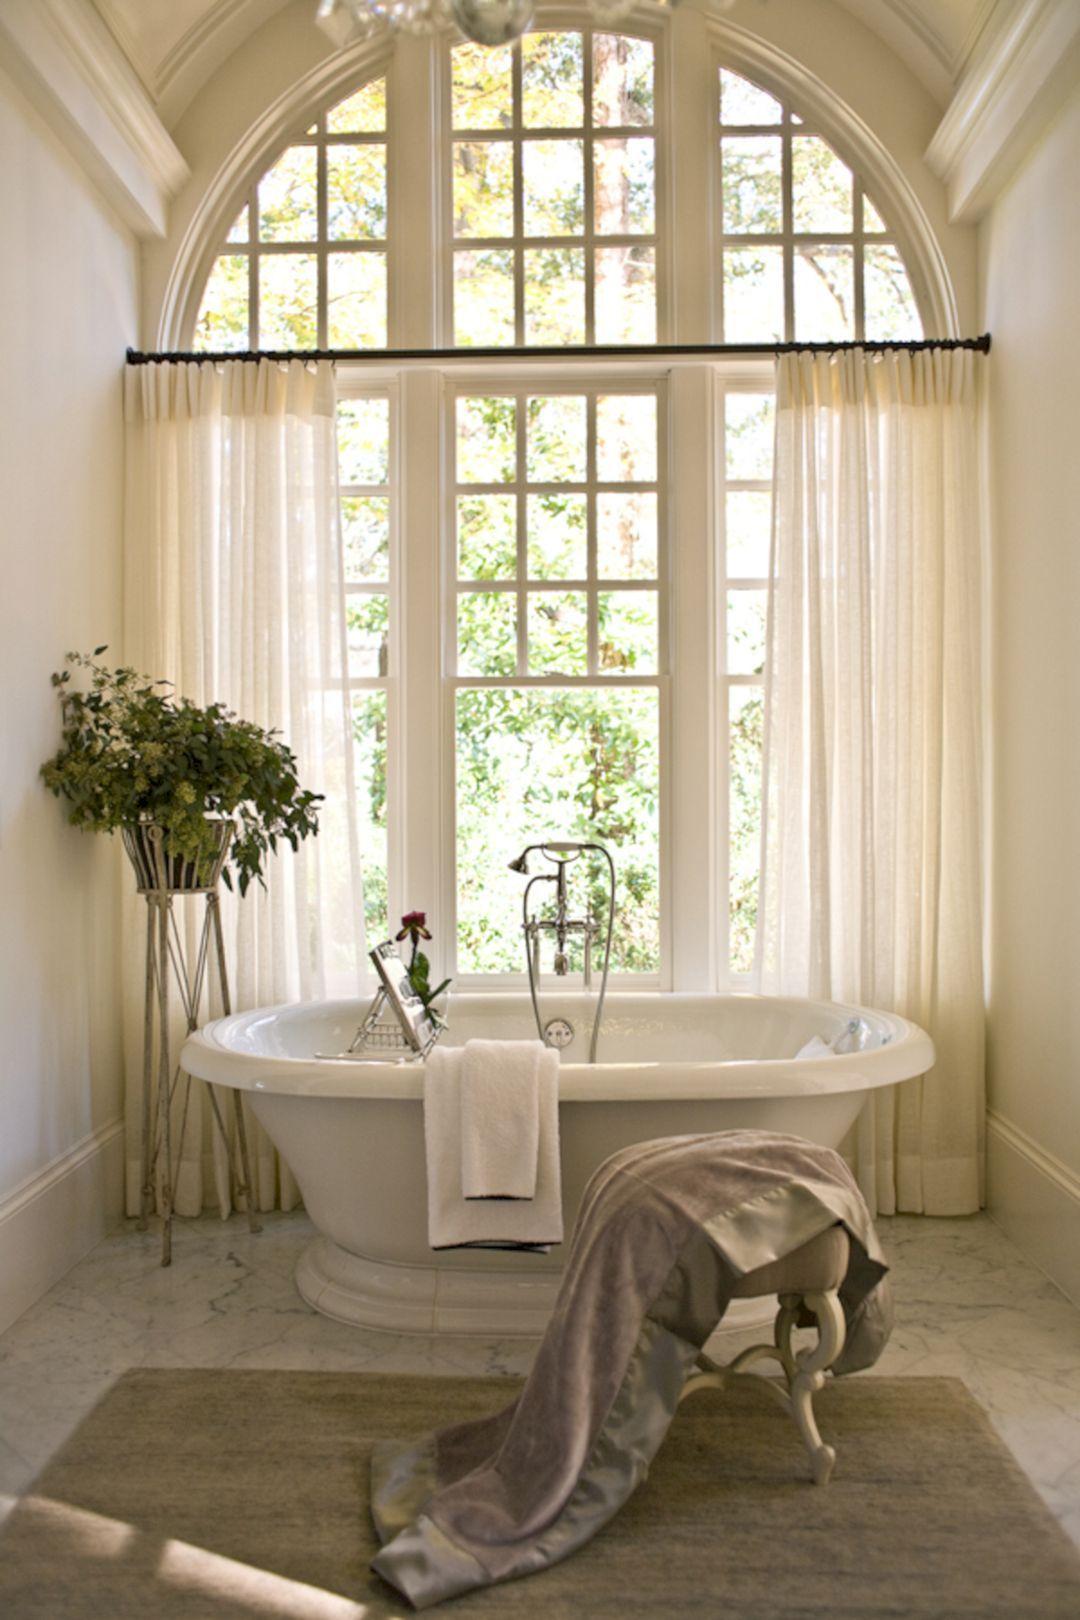 65+ Luxurious Master Bathroom Design Ideas For Amazing Homes ...